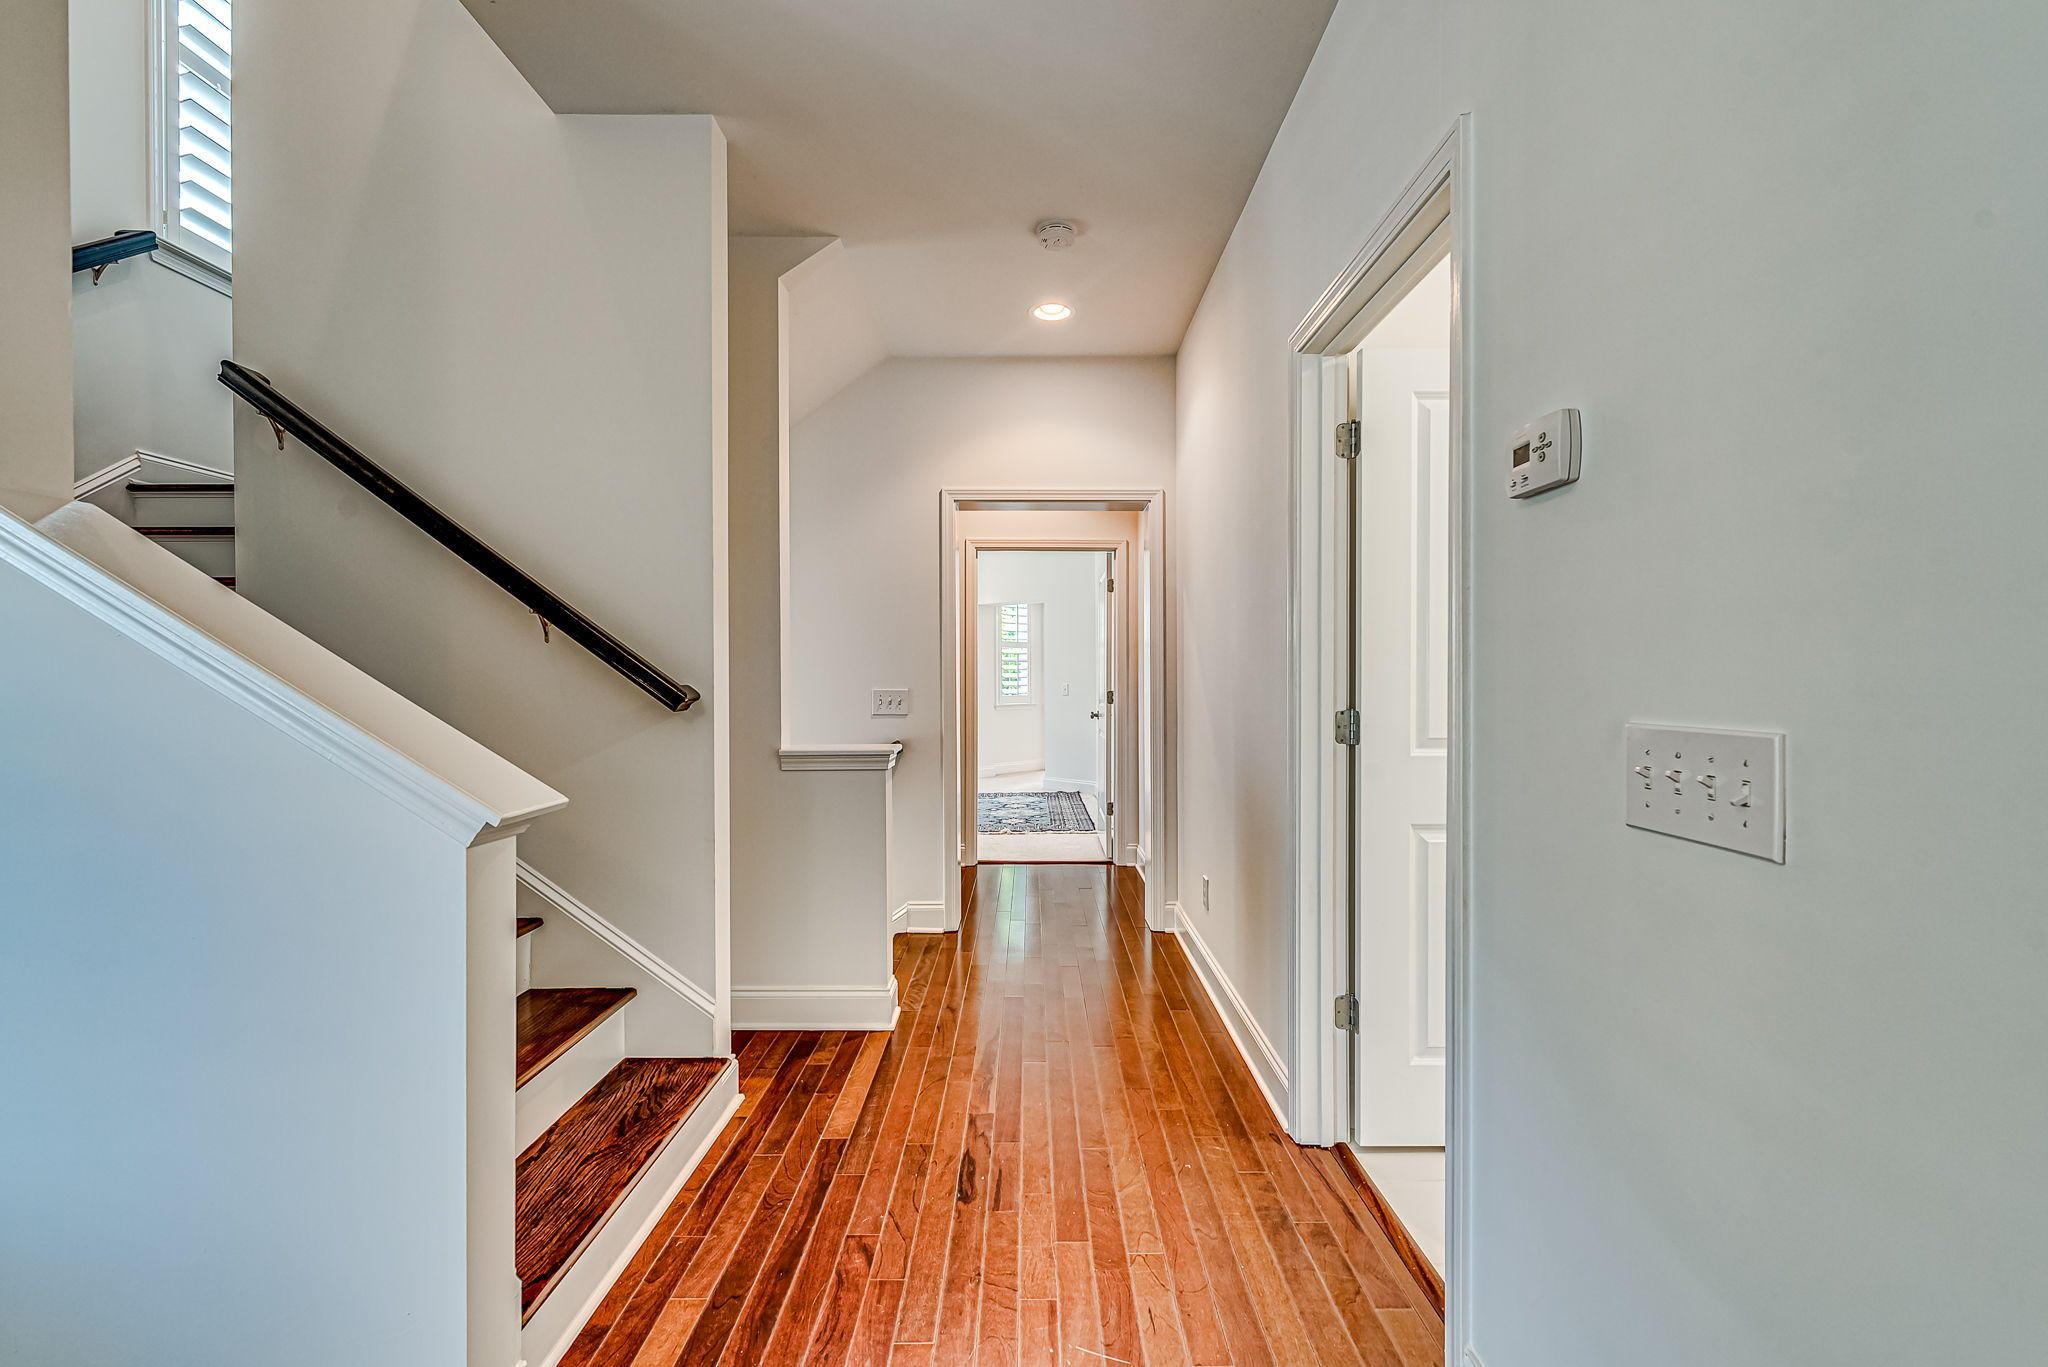 Dunes West Homes For Sale - 2476 Kings Gate, Mount Pleasant, SC - 22